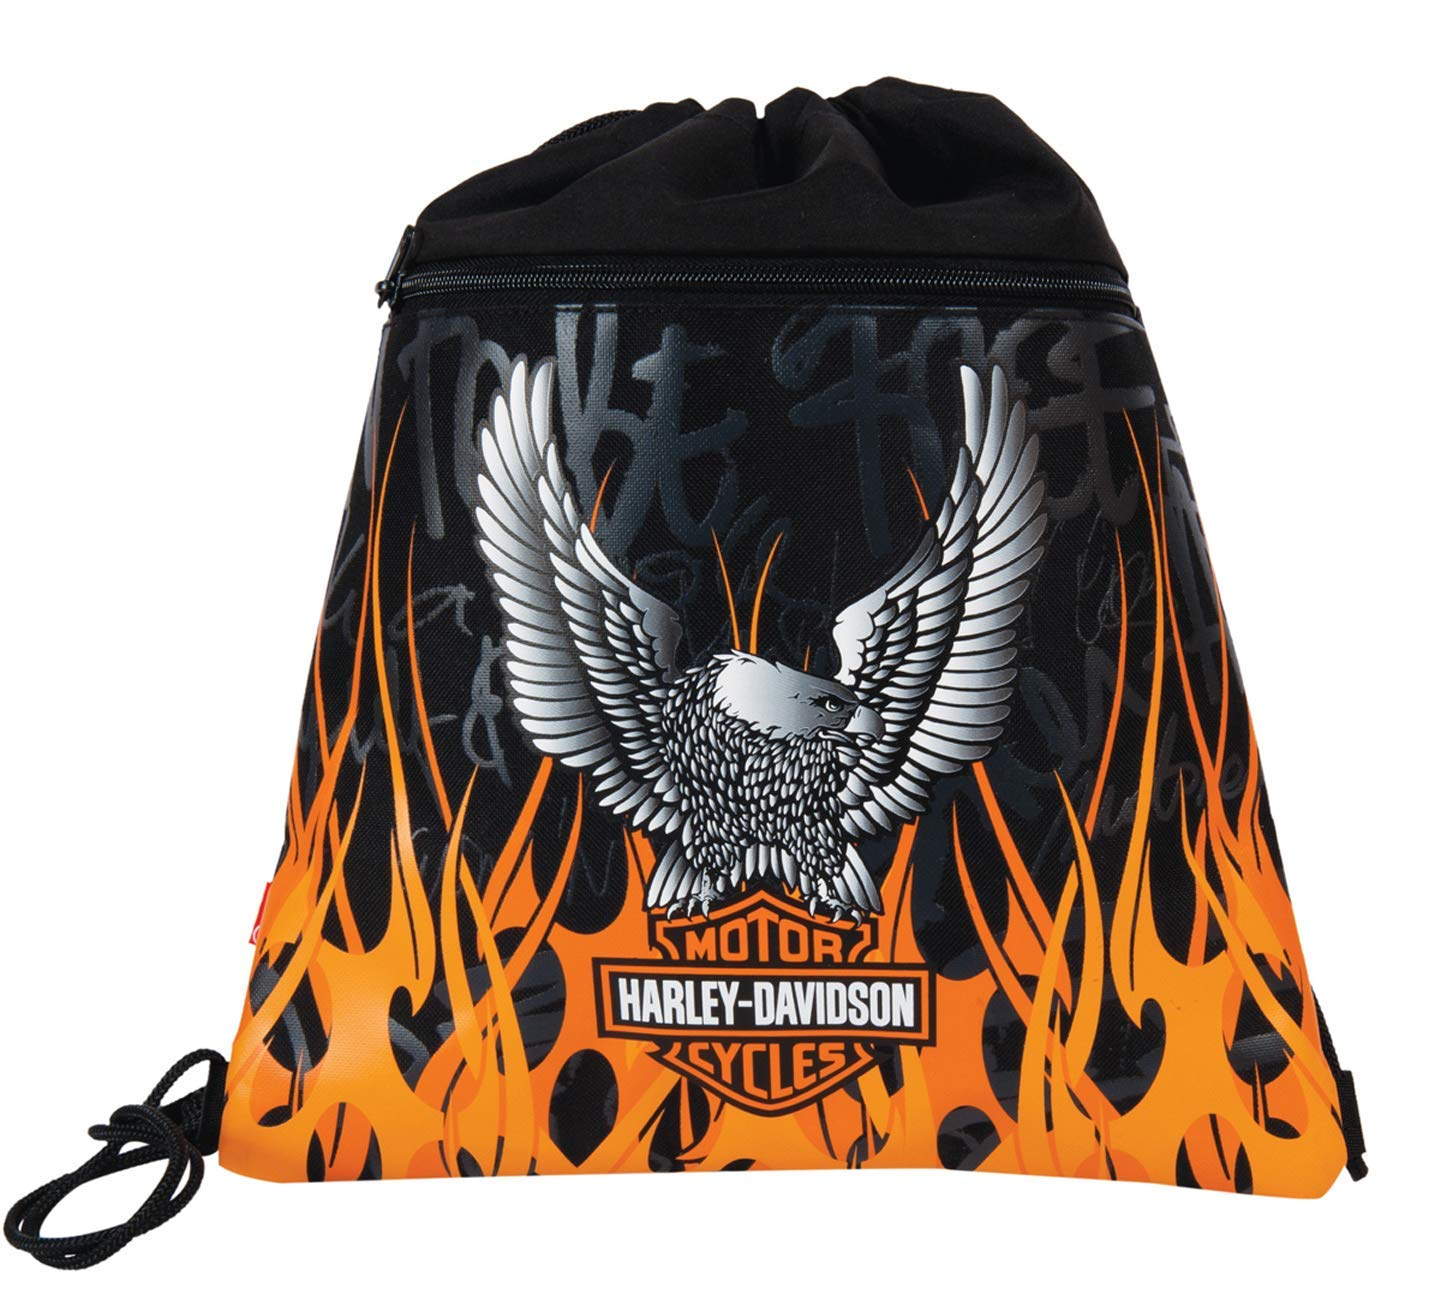 Harley-Davidson Bolso de Gimnasio, Color Negro/Naranja Harley Davidson 11-1989